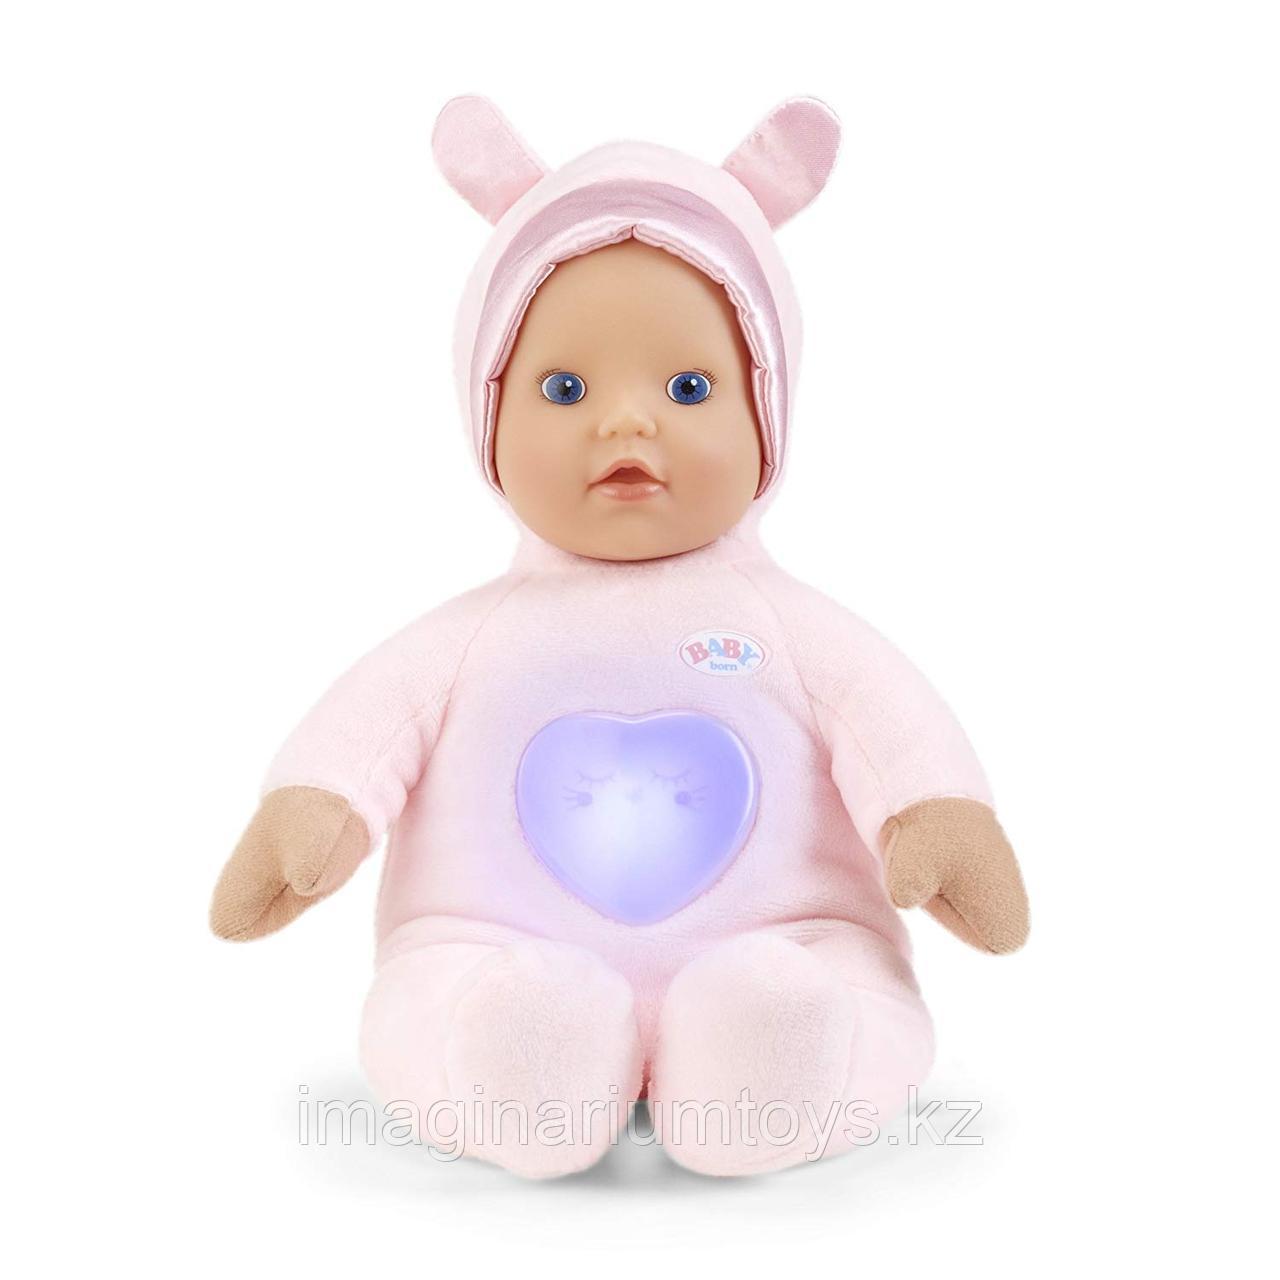 Кукла Baby Born для малышей 0+ интерактивная Беби Борн